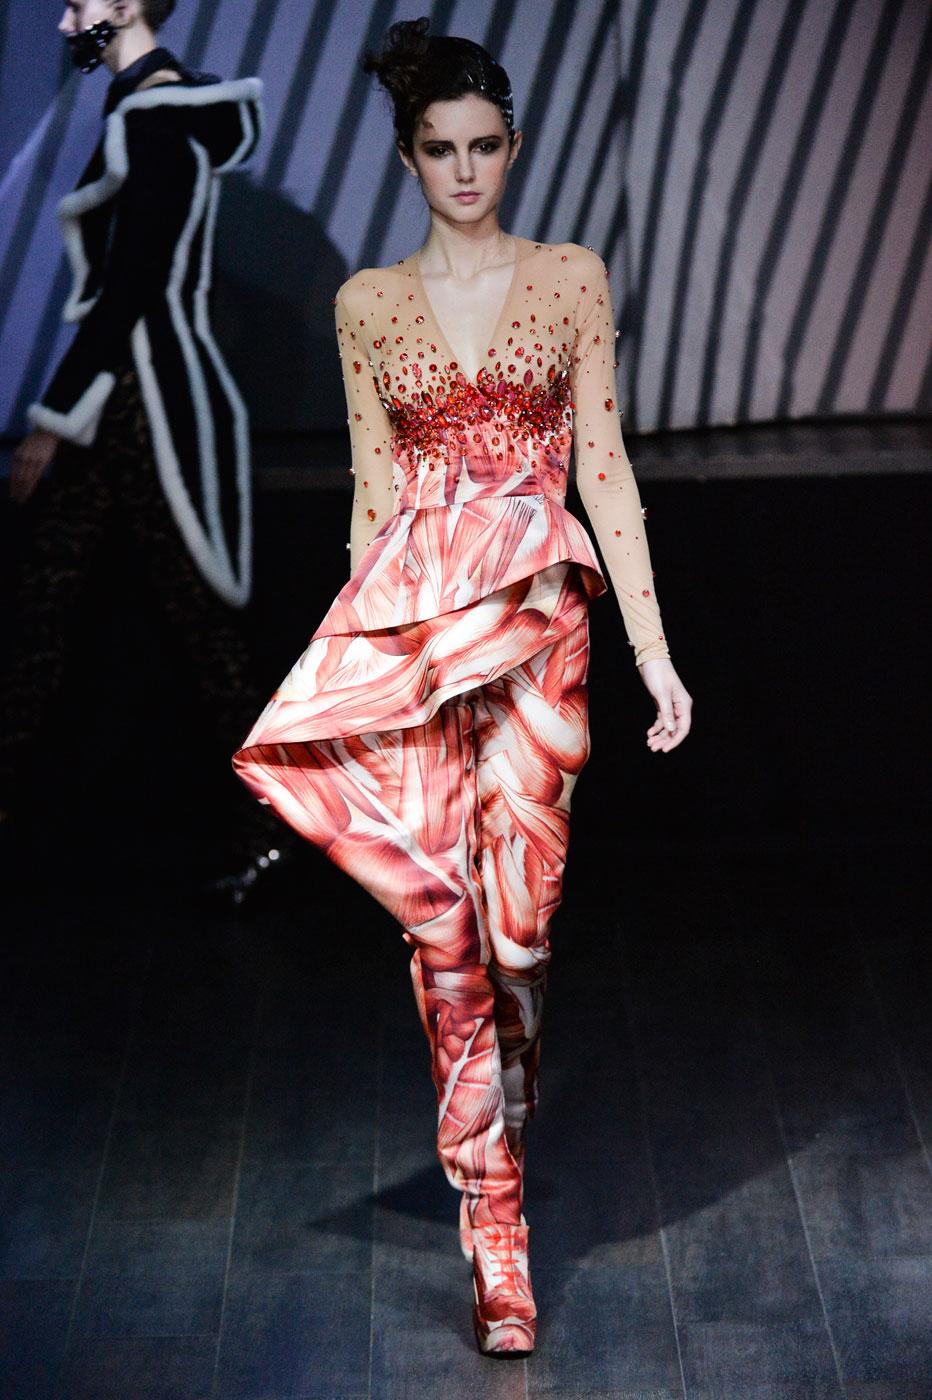 On-Aura-Tout-Vu-fashion-runway-show-haute-couture-paris-spring-summer-2015-the-impression-23